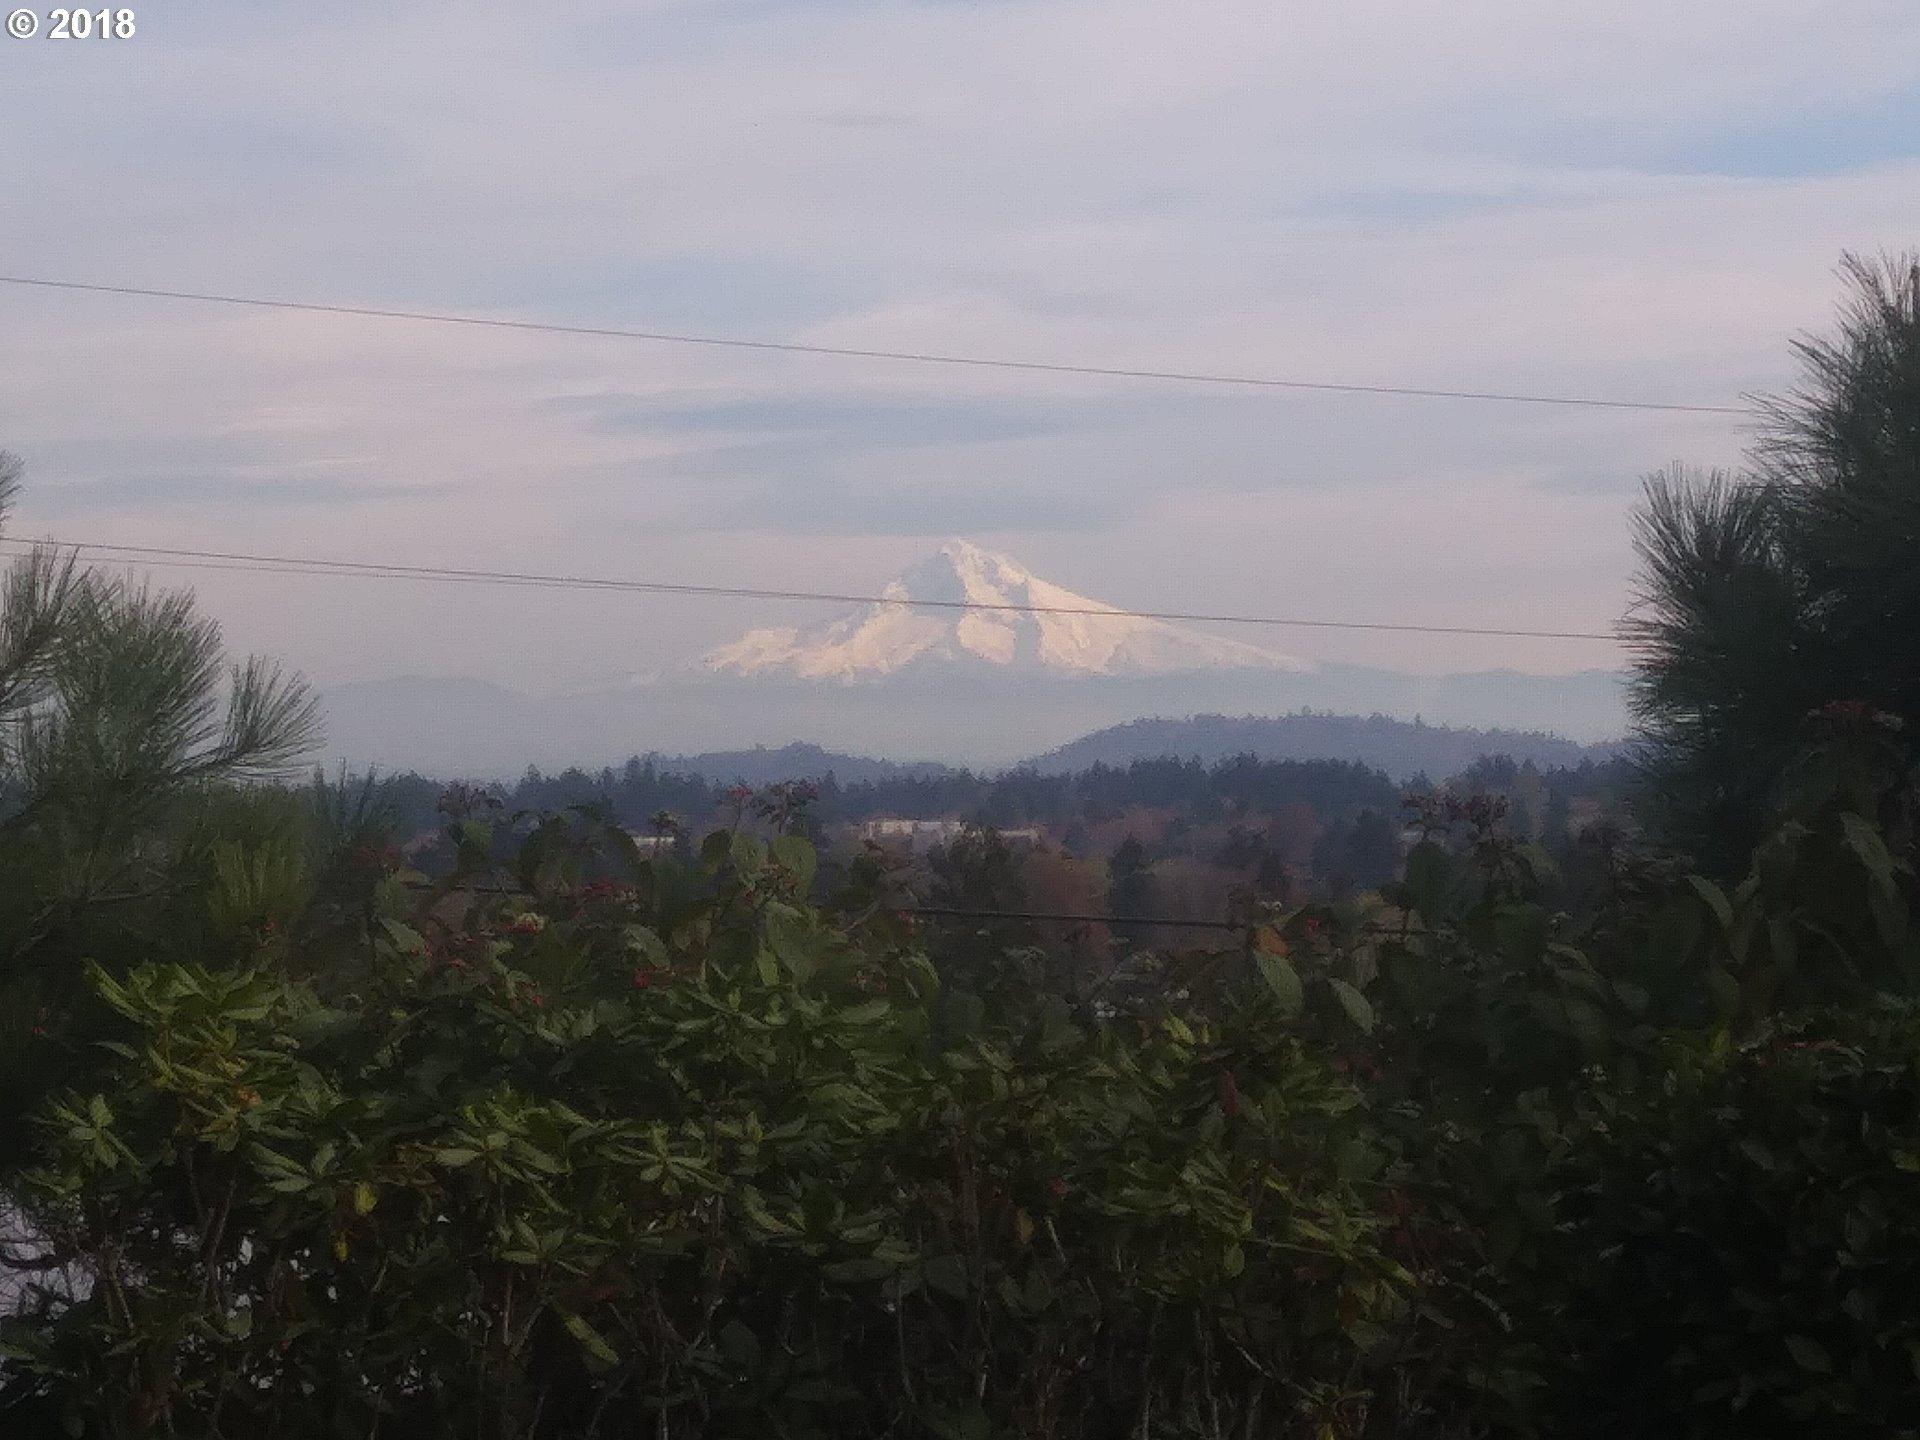 834 SE 72ND AVE Portland, OR 97215 - MLS #: 18333757